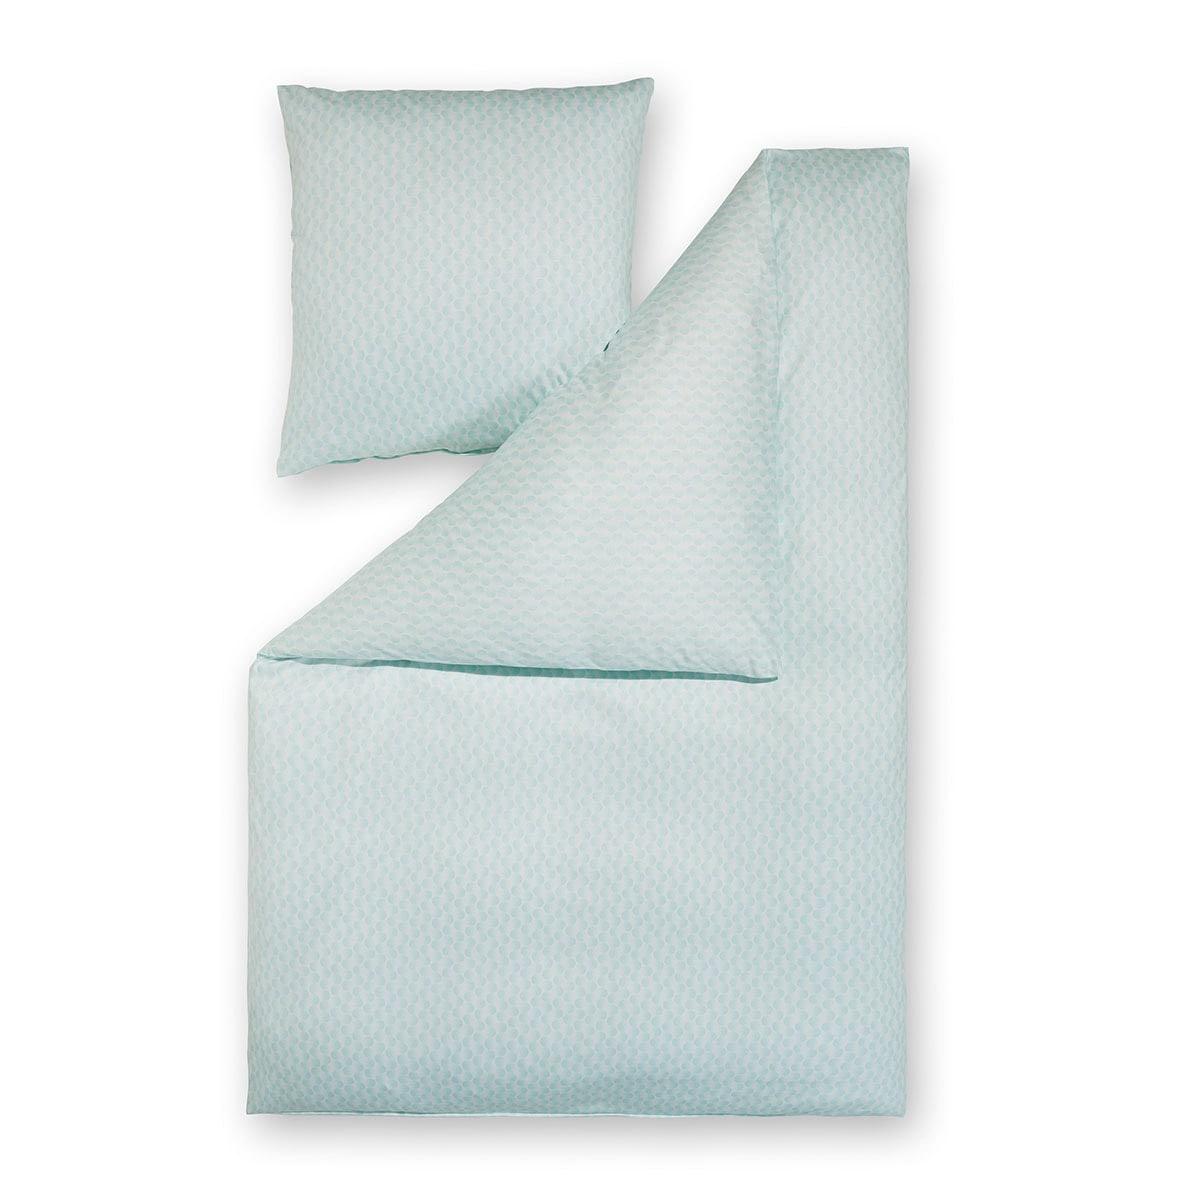 estella mako interlock jersey bettw sche dilan aqua. Black Bedroom Furniture Sets. Home Design Ideas